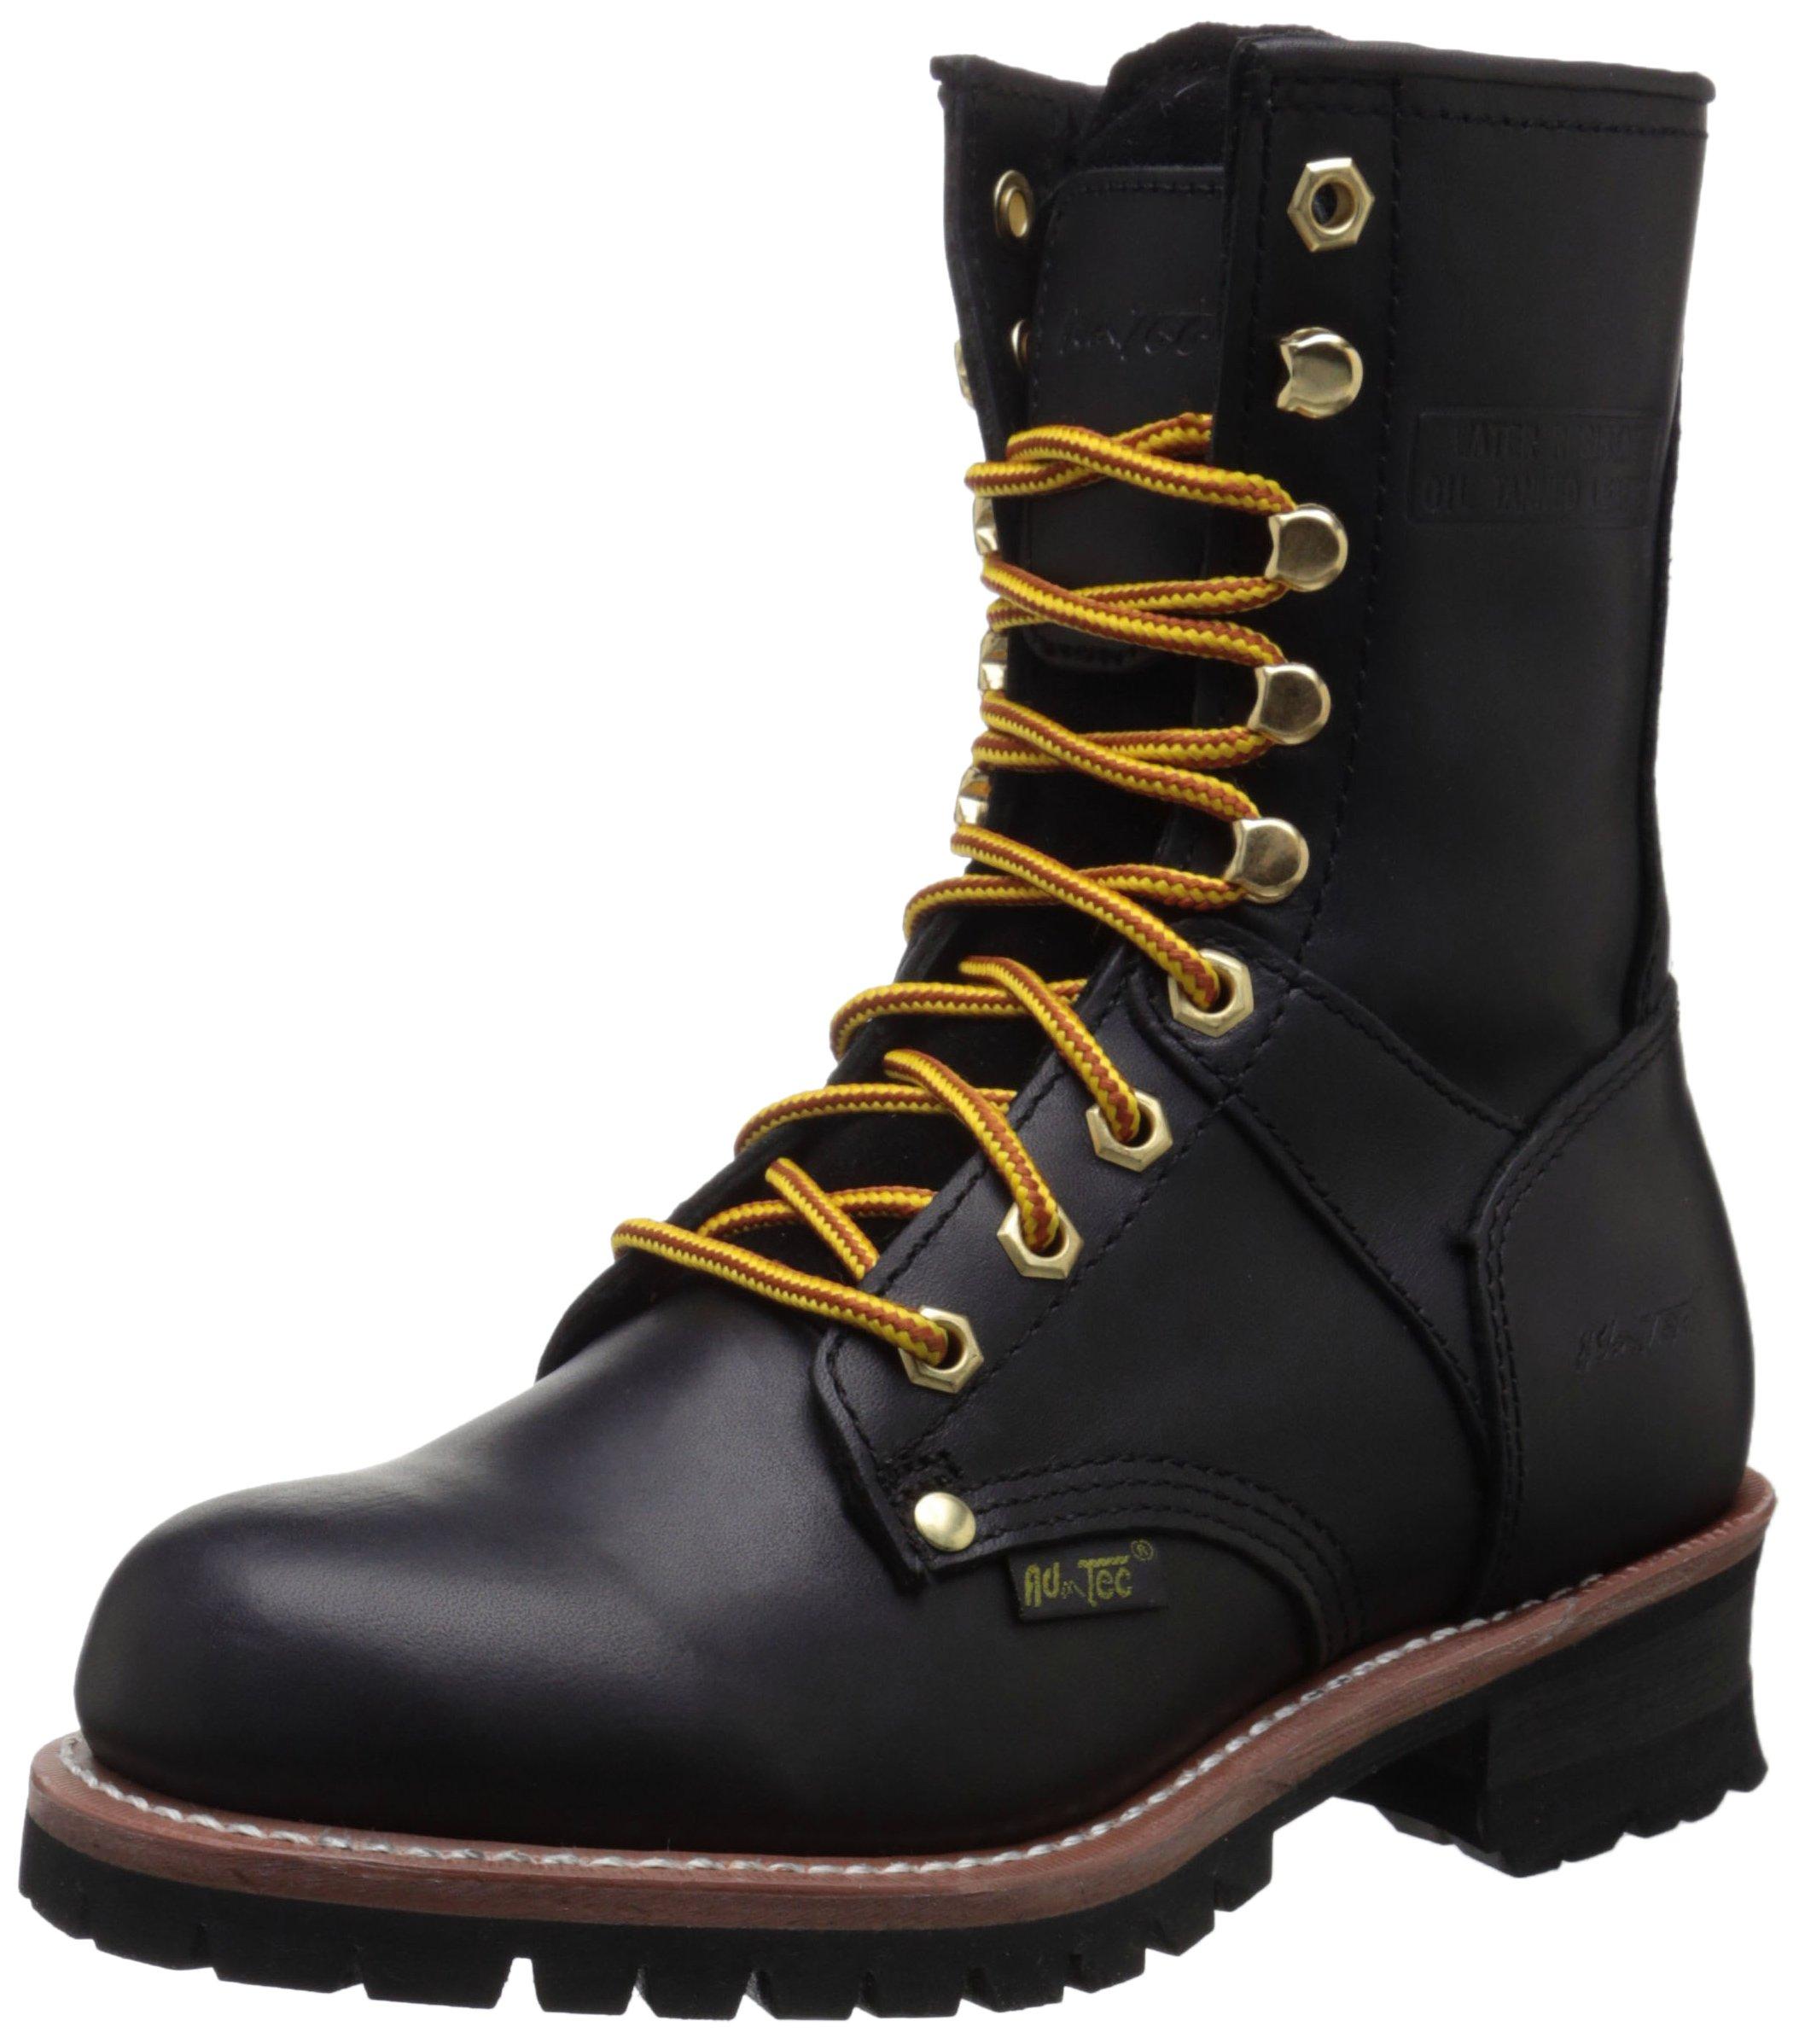 Adtec Women's 9'' Logger Work Boot, Black, 7.5 M US